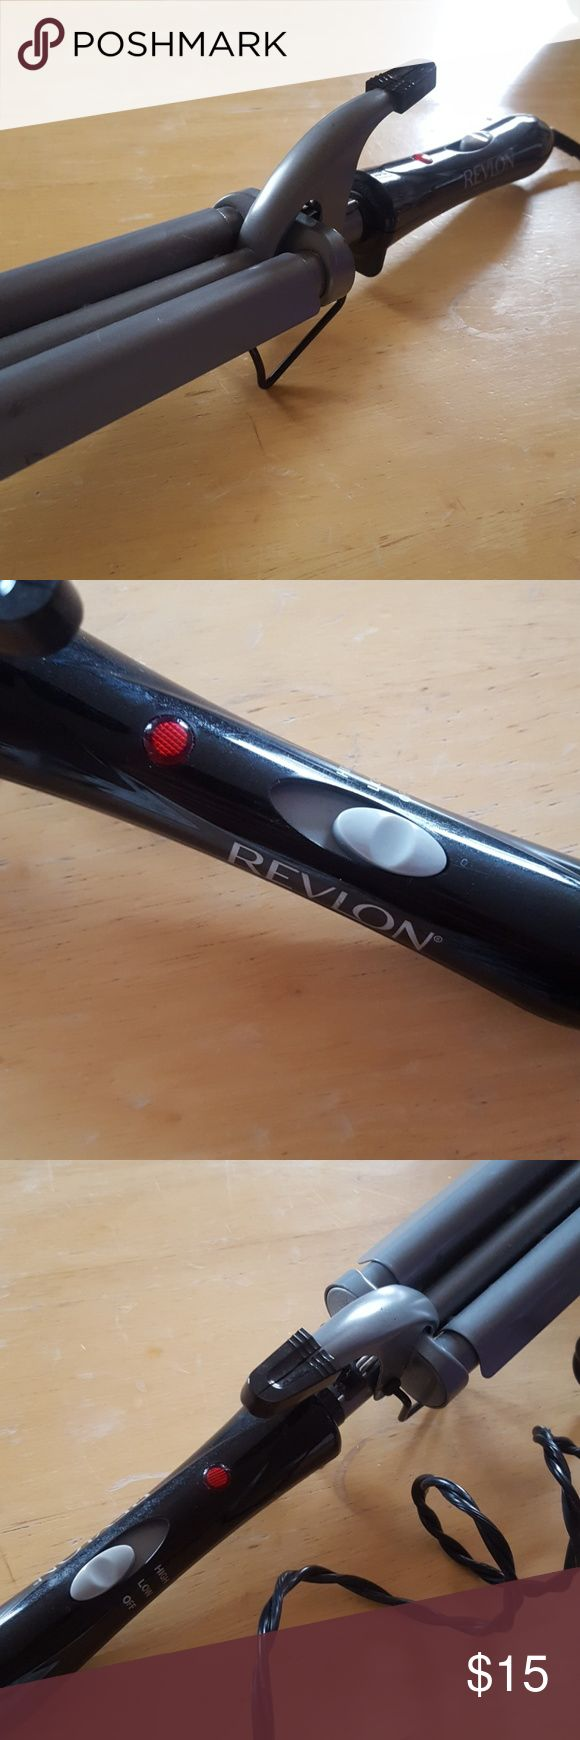 Revlon Crimper Hair crimper, hair waver Revlon Other